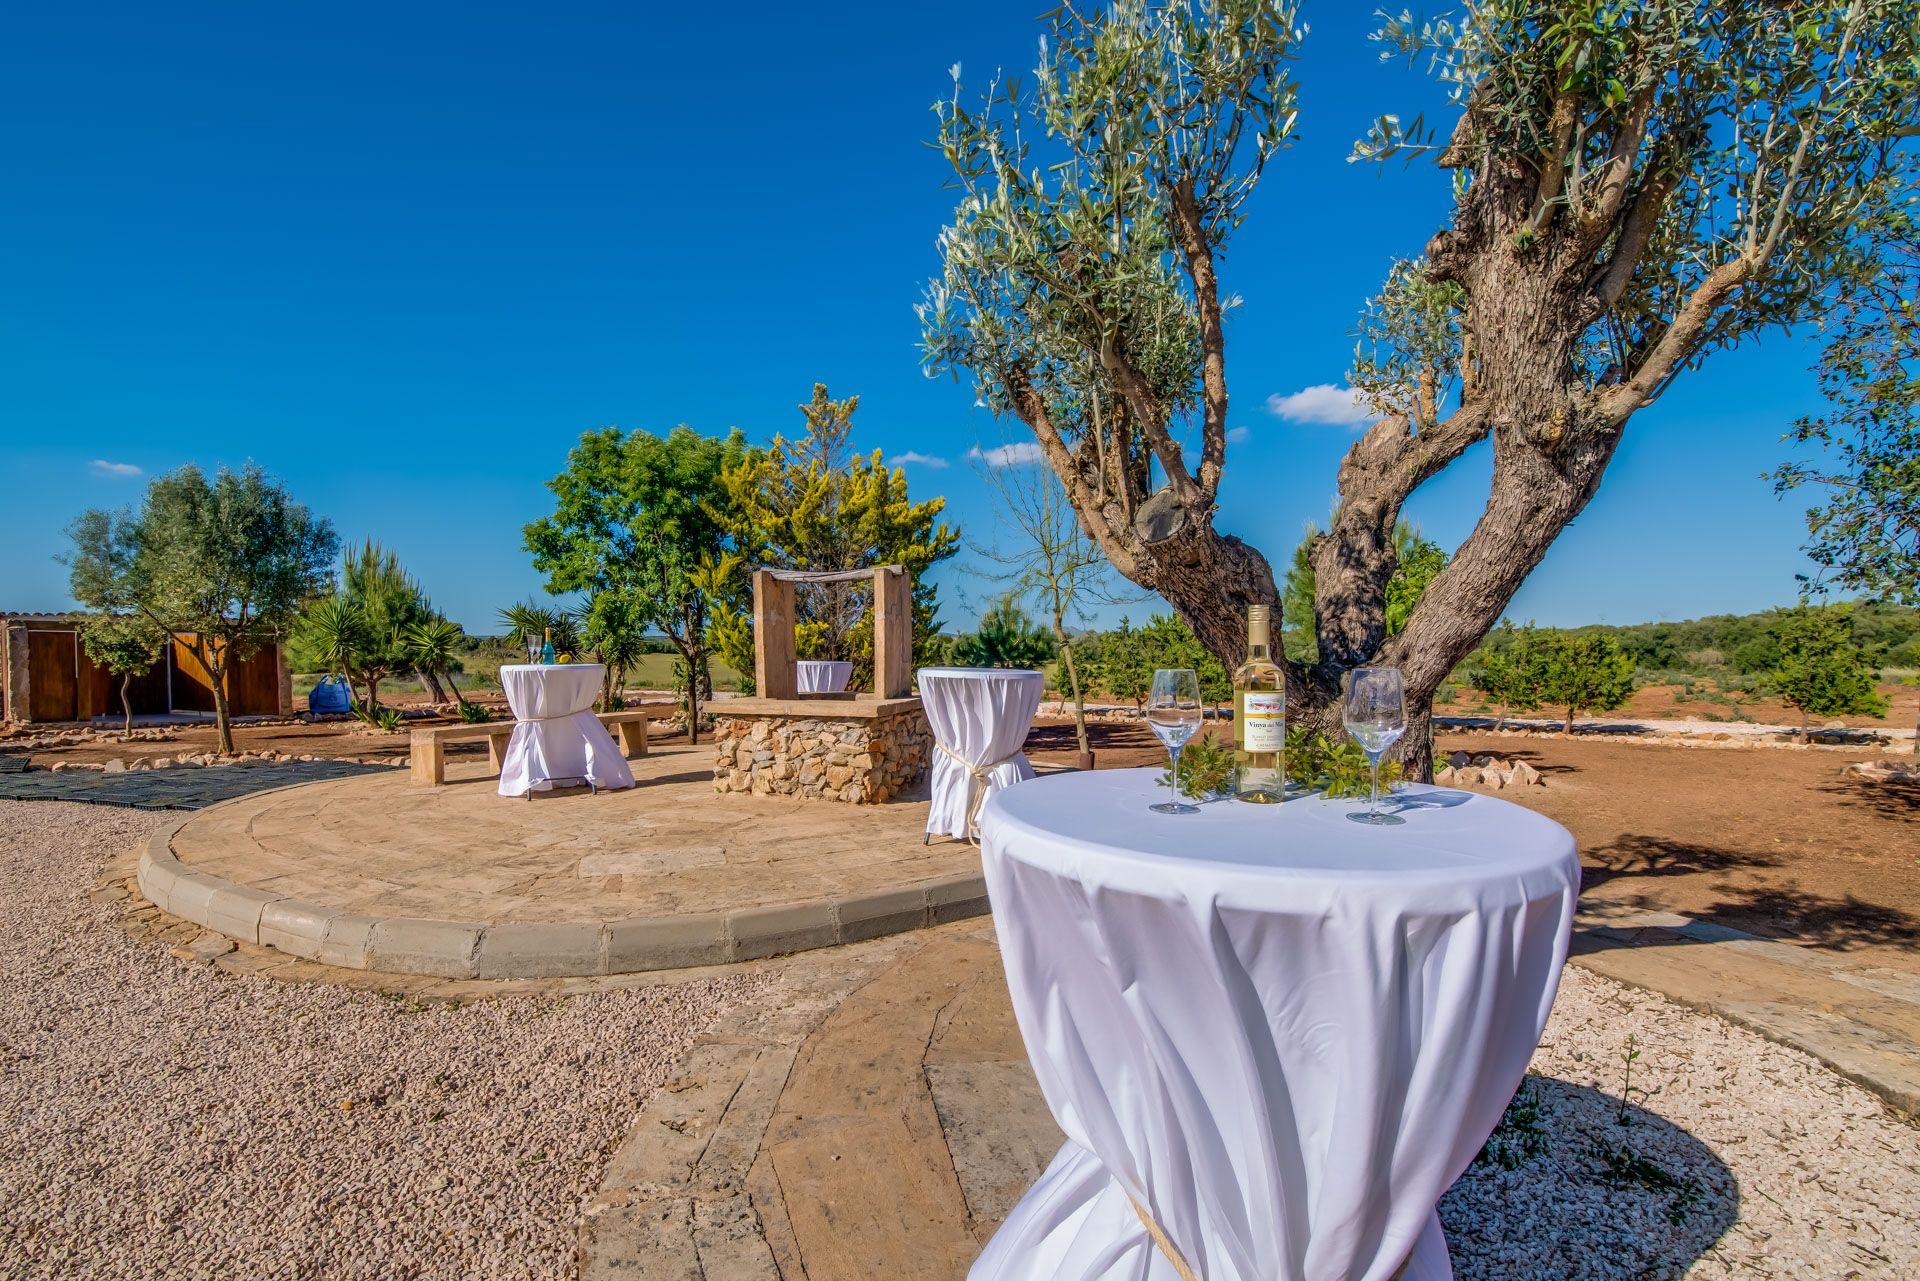 Celebraciones al aire libre en Mallorca